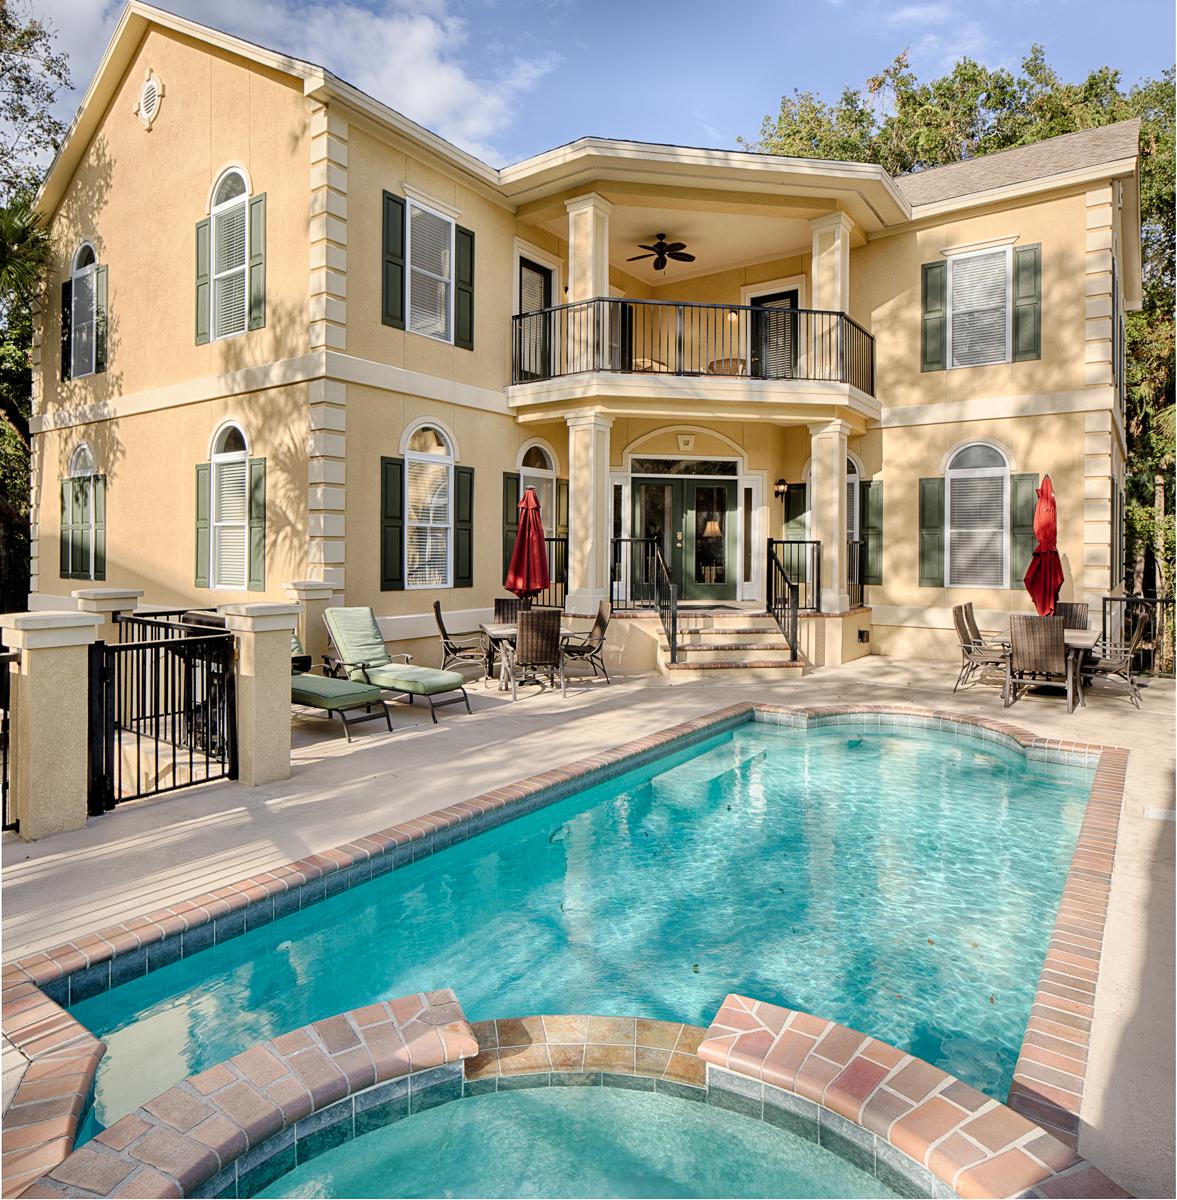 Additional photo for property listing at 15 FOREST BEACH DRIVE N 15 Forest Beach Drive N Hilton Head Island, Carolina Del Sur 29928 Estados Unidos